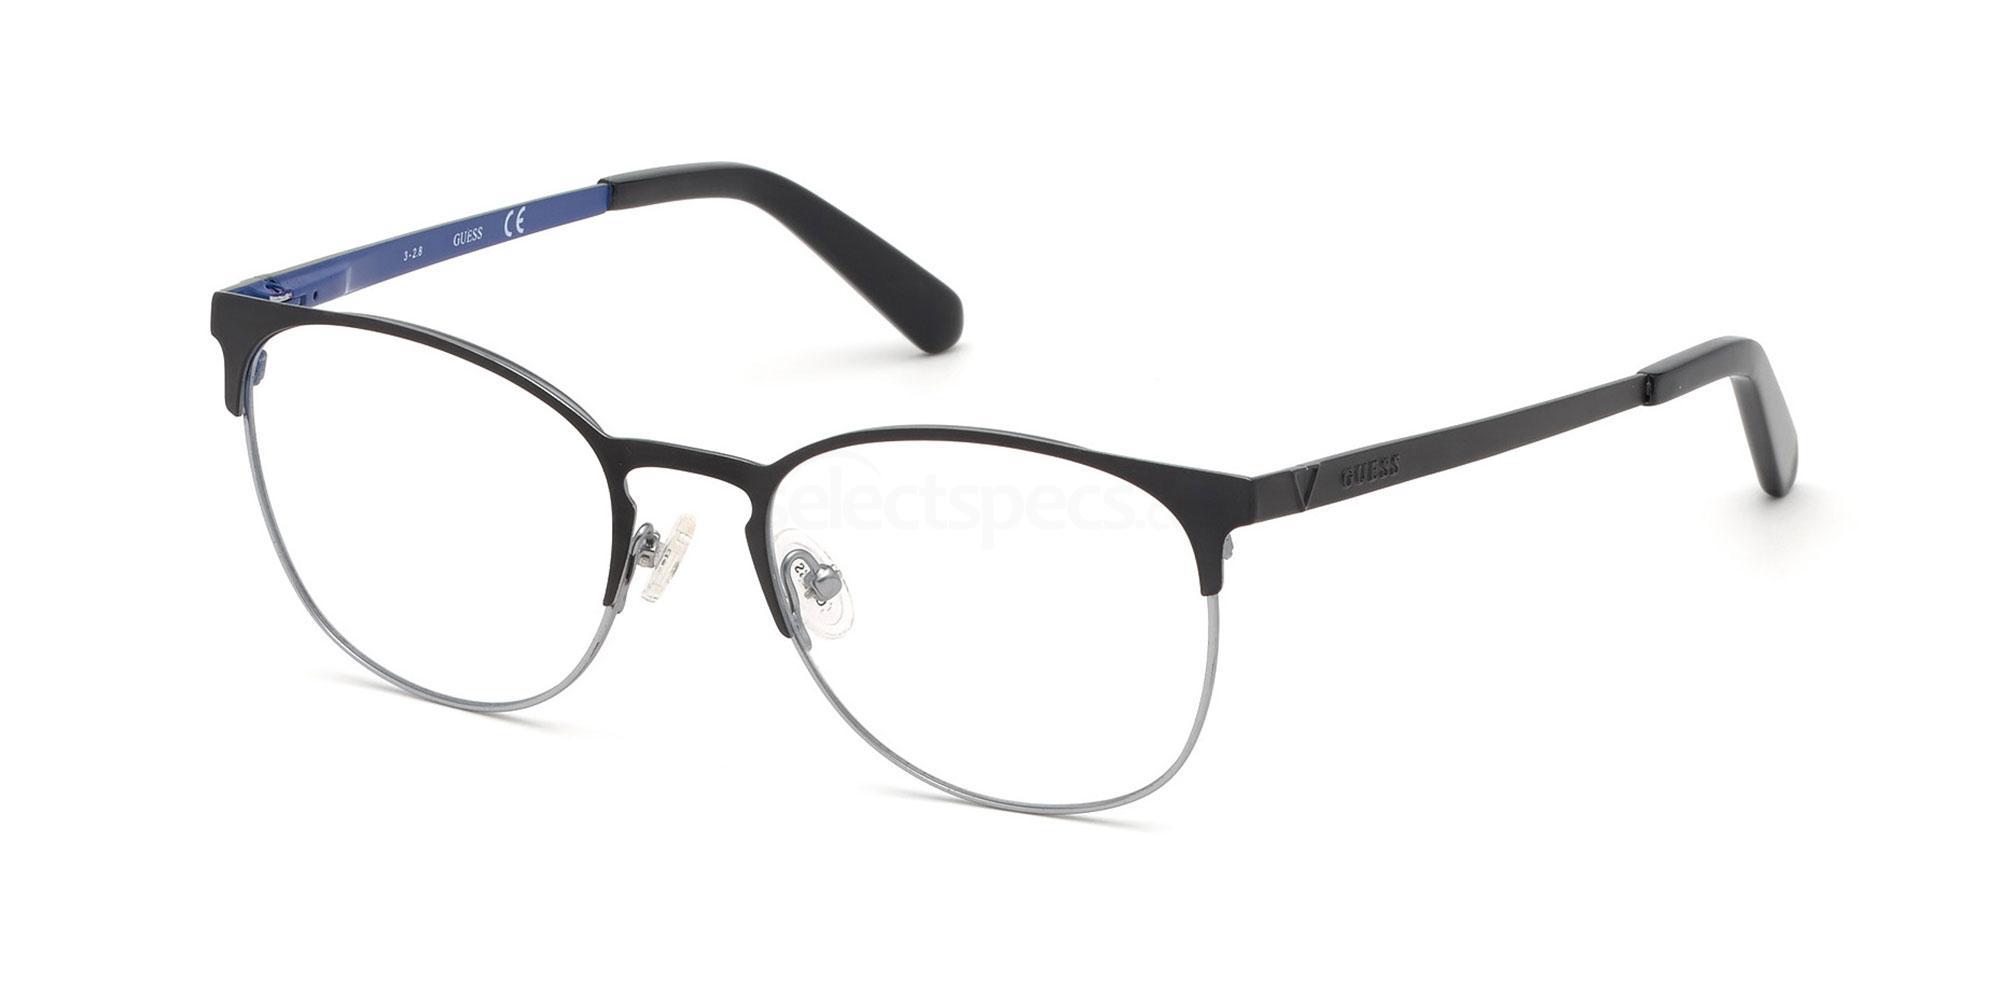 005 GU1976 Glasses, Guess